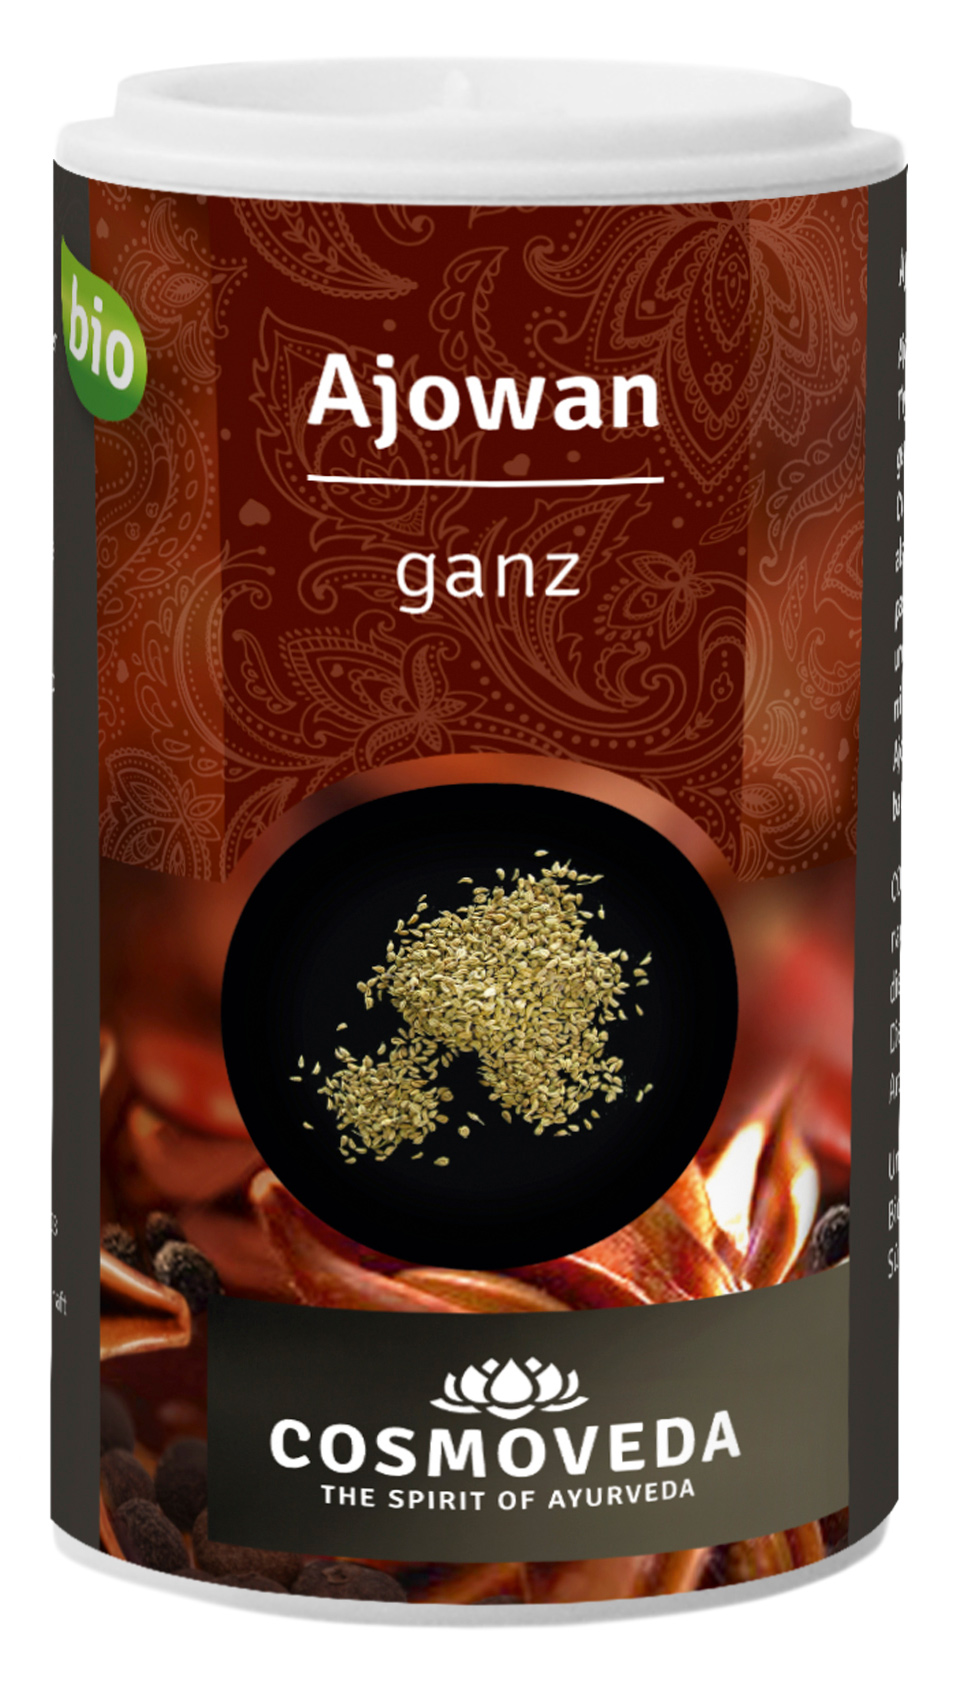 Bio Ajowan / Ajwain (Königskümmel), ganz, 30 g